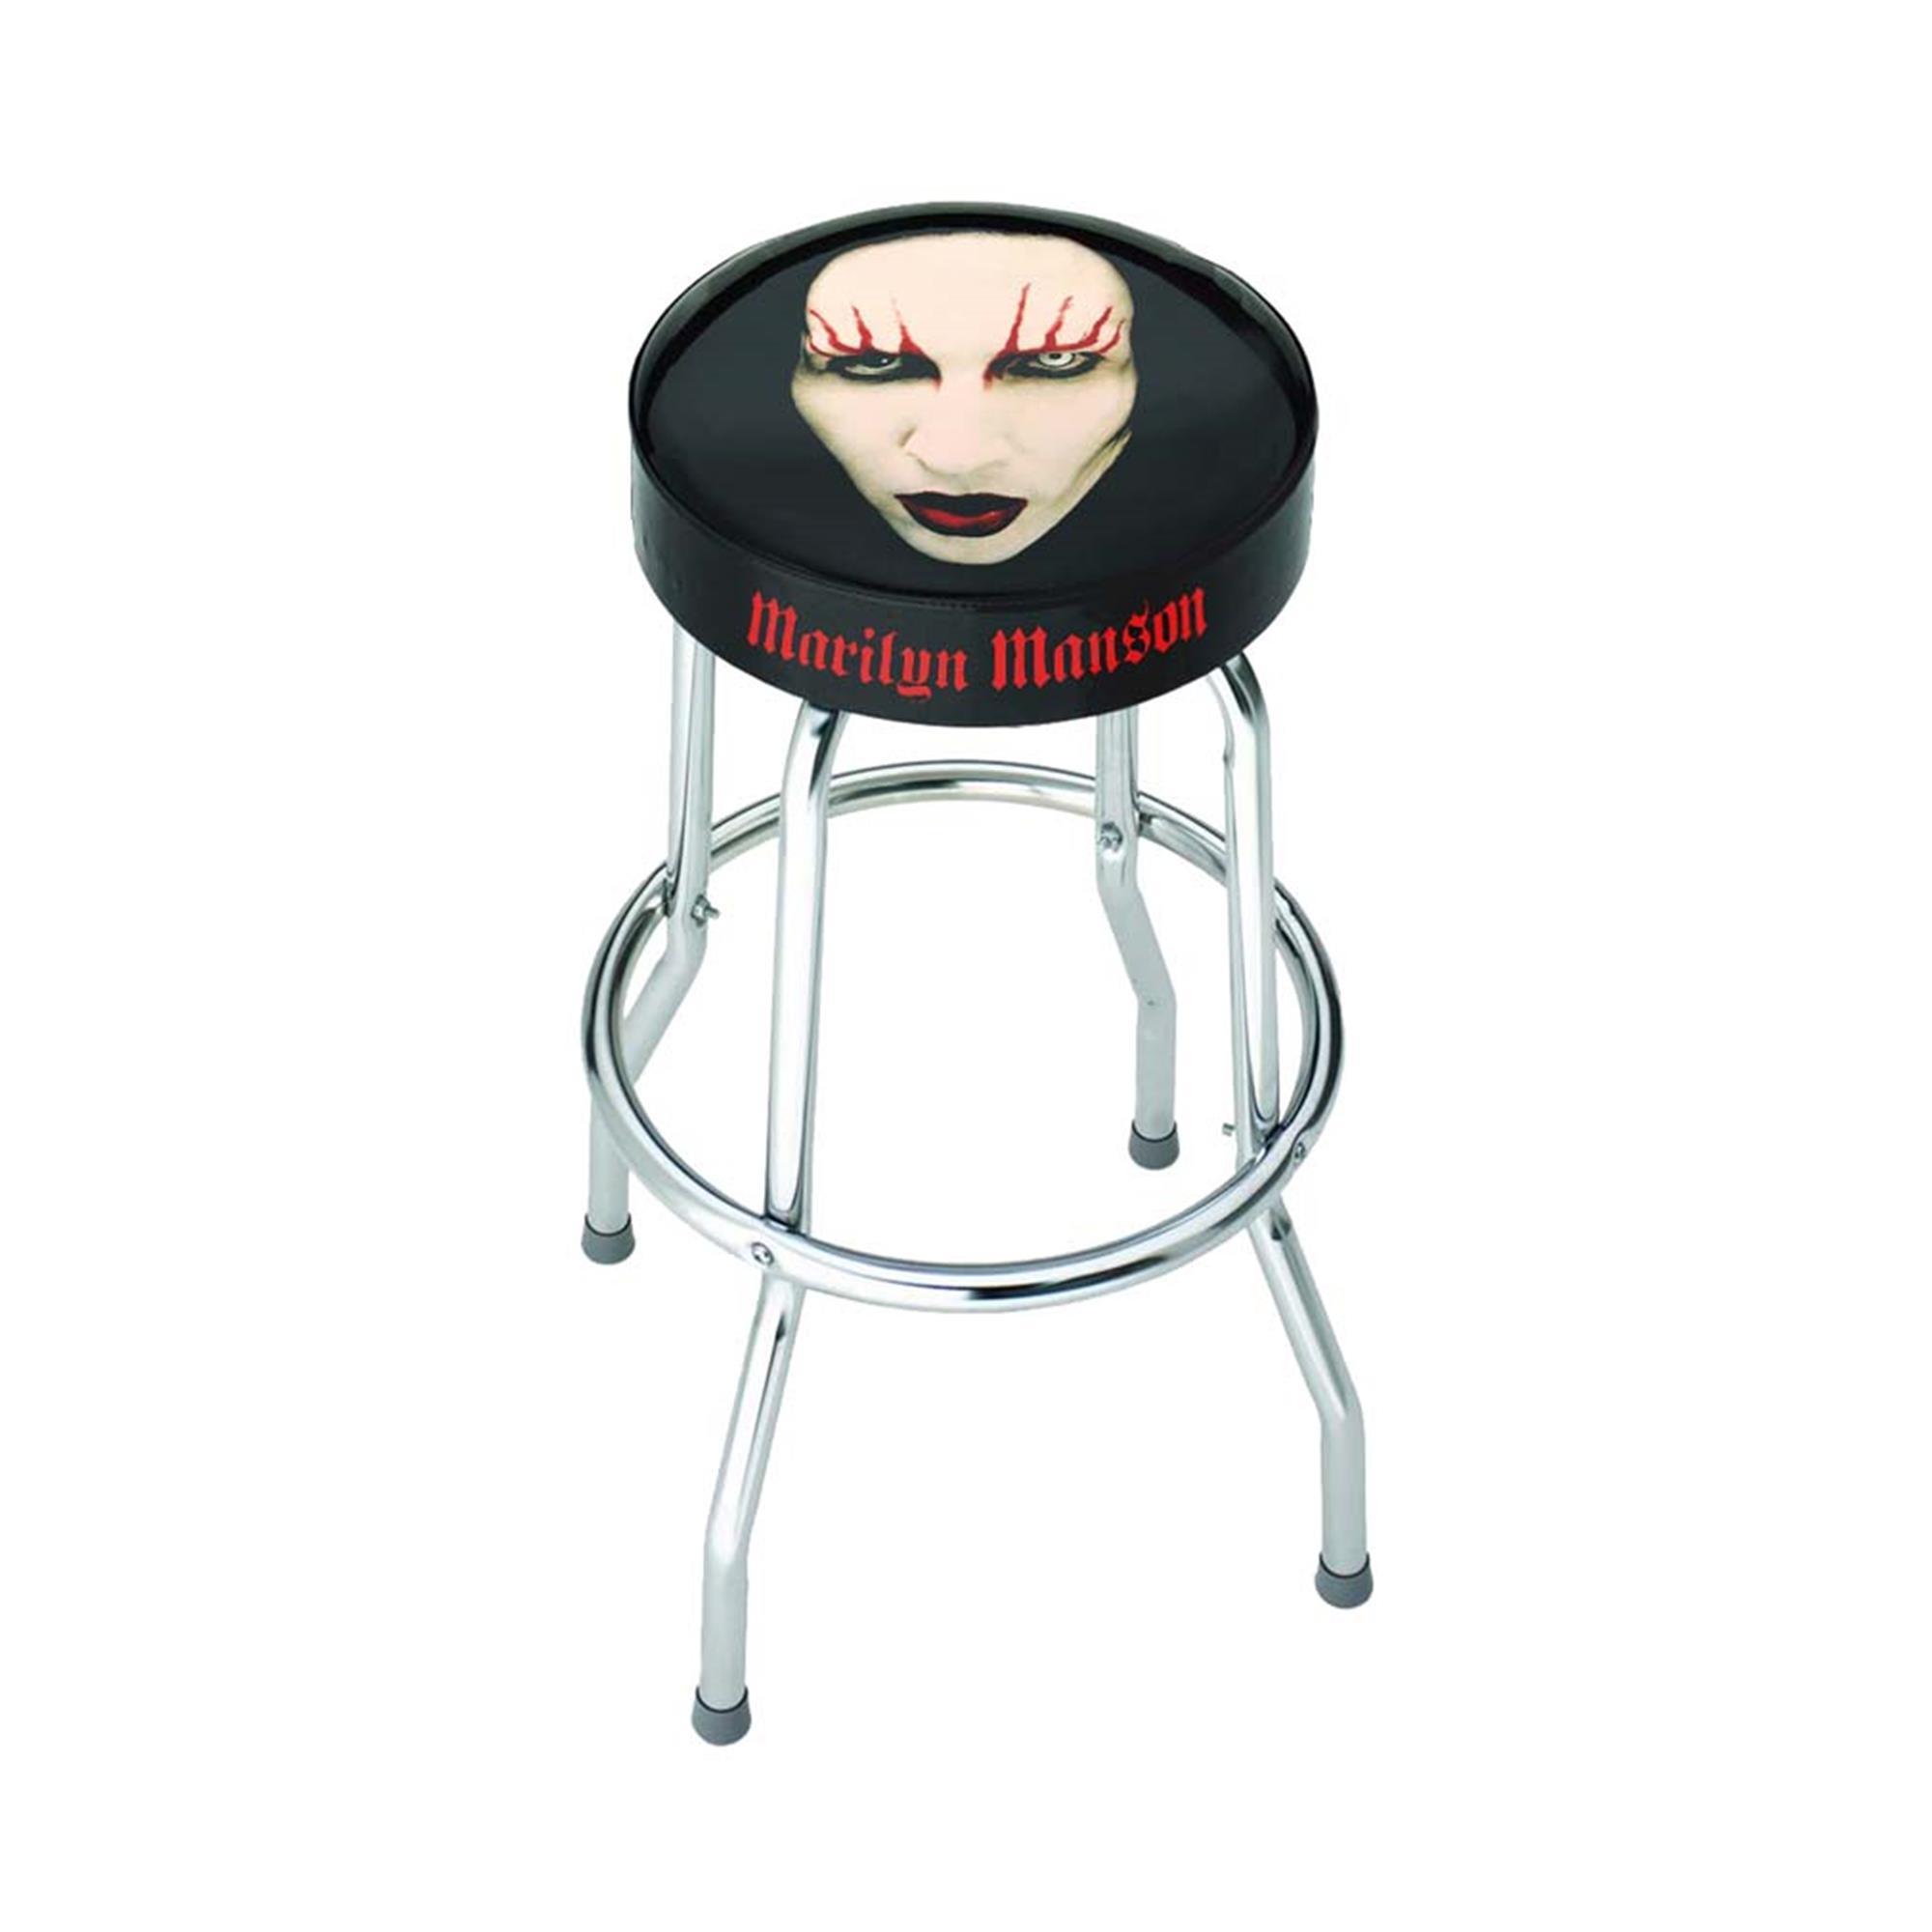 Marilyn Manson Red Lips Bar Stool